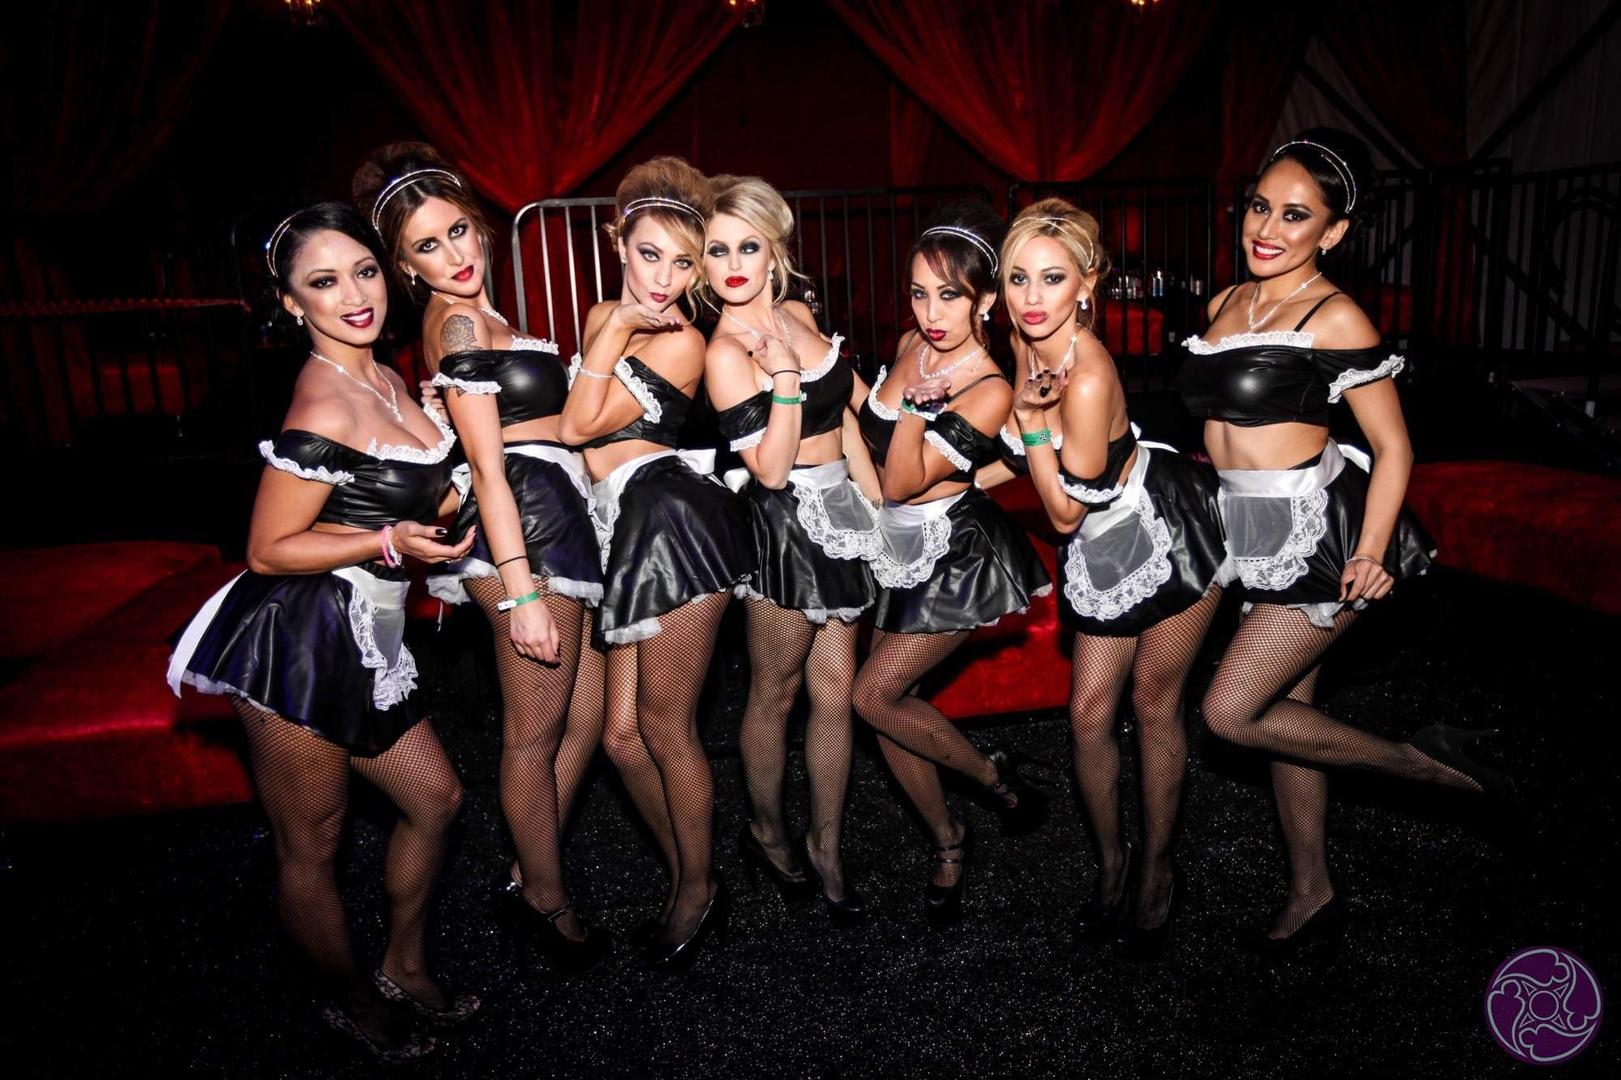 Maxim Halloween Party VIP Hostesses. Call 1-877-MAXIM-02 for tickets to all upcoming Maxim Experiences.